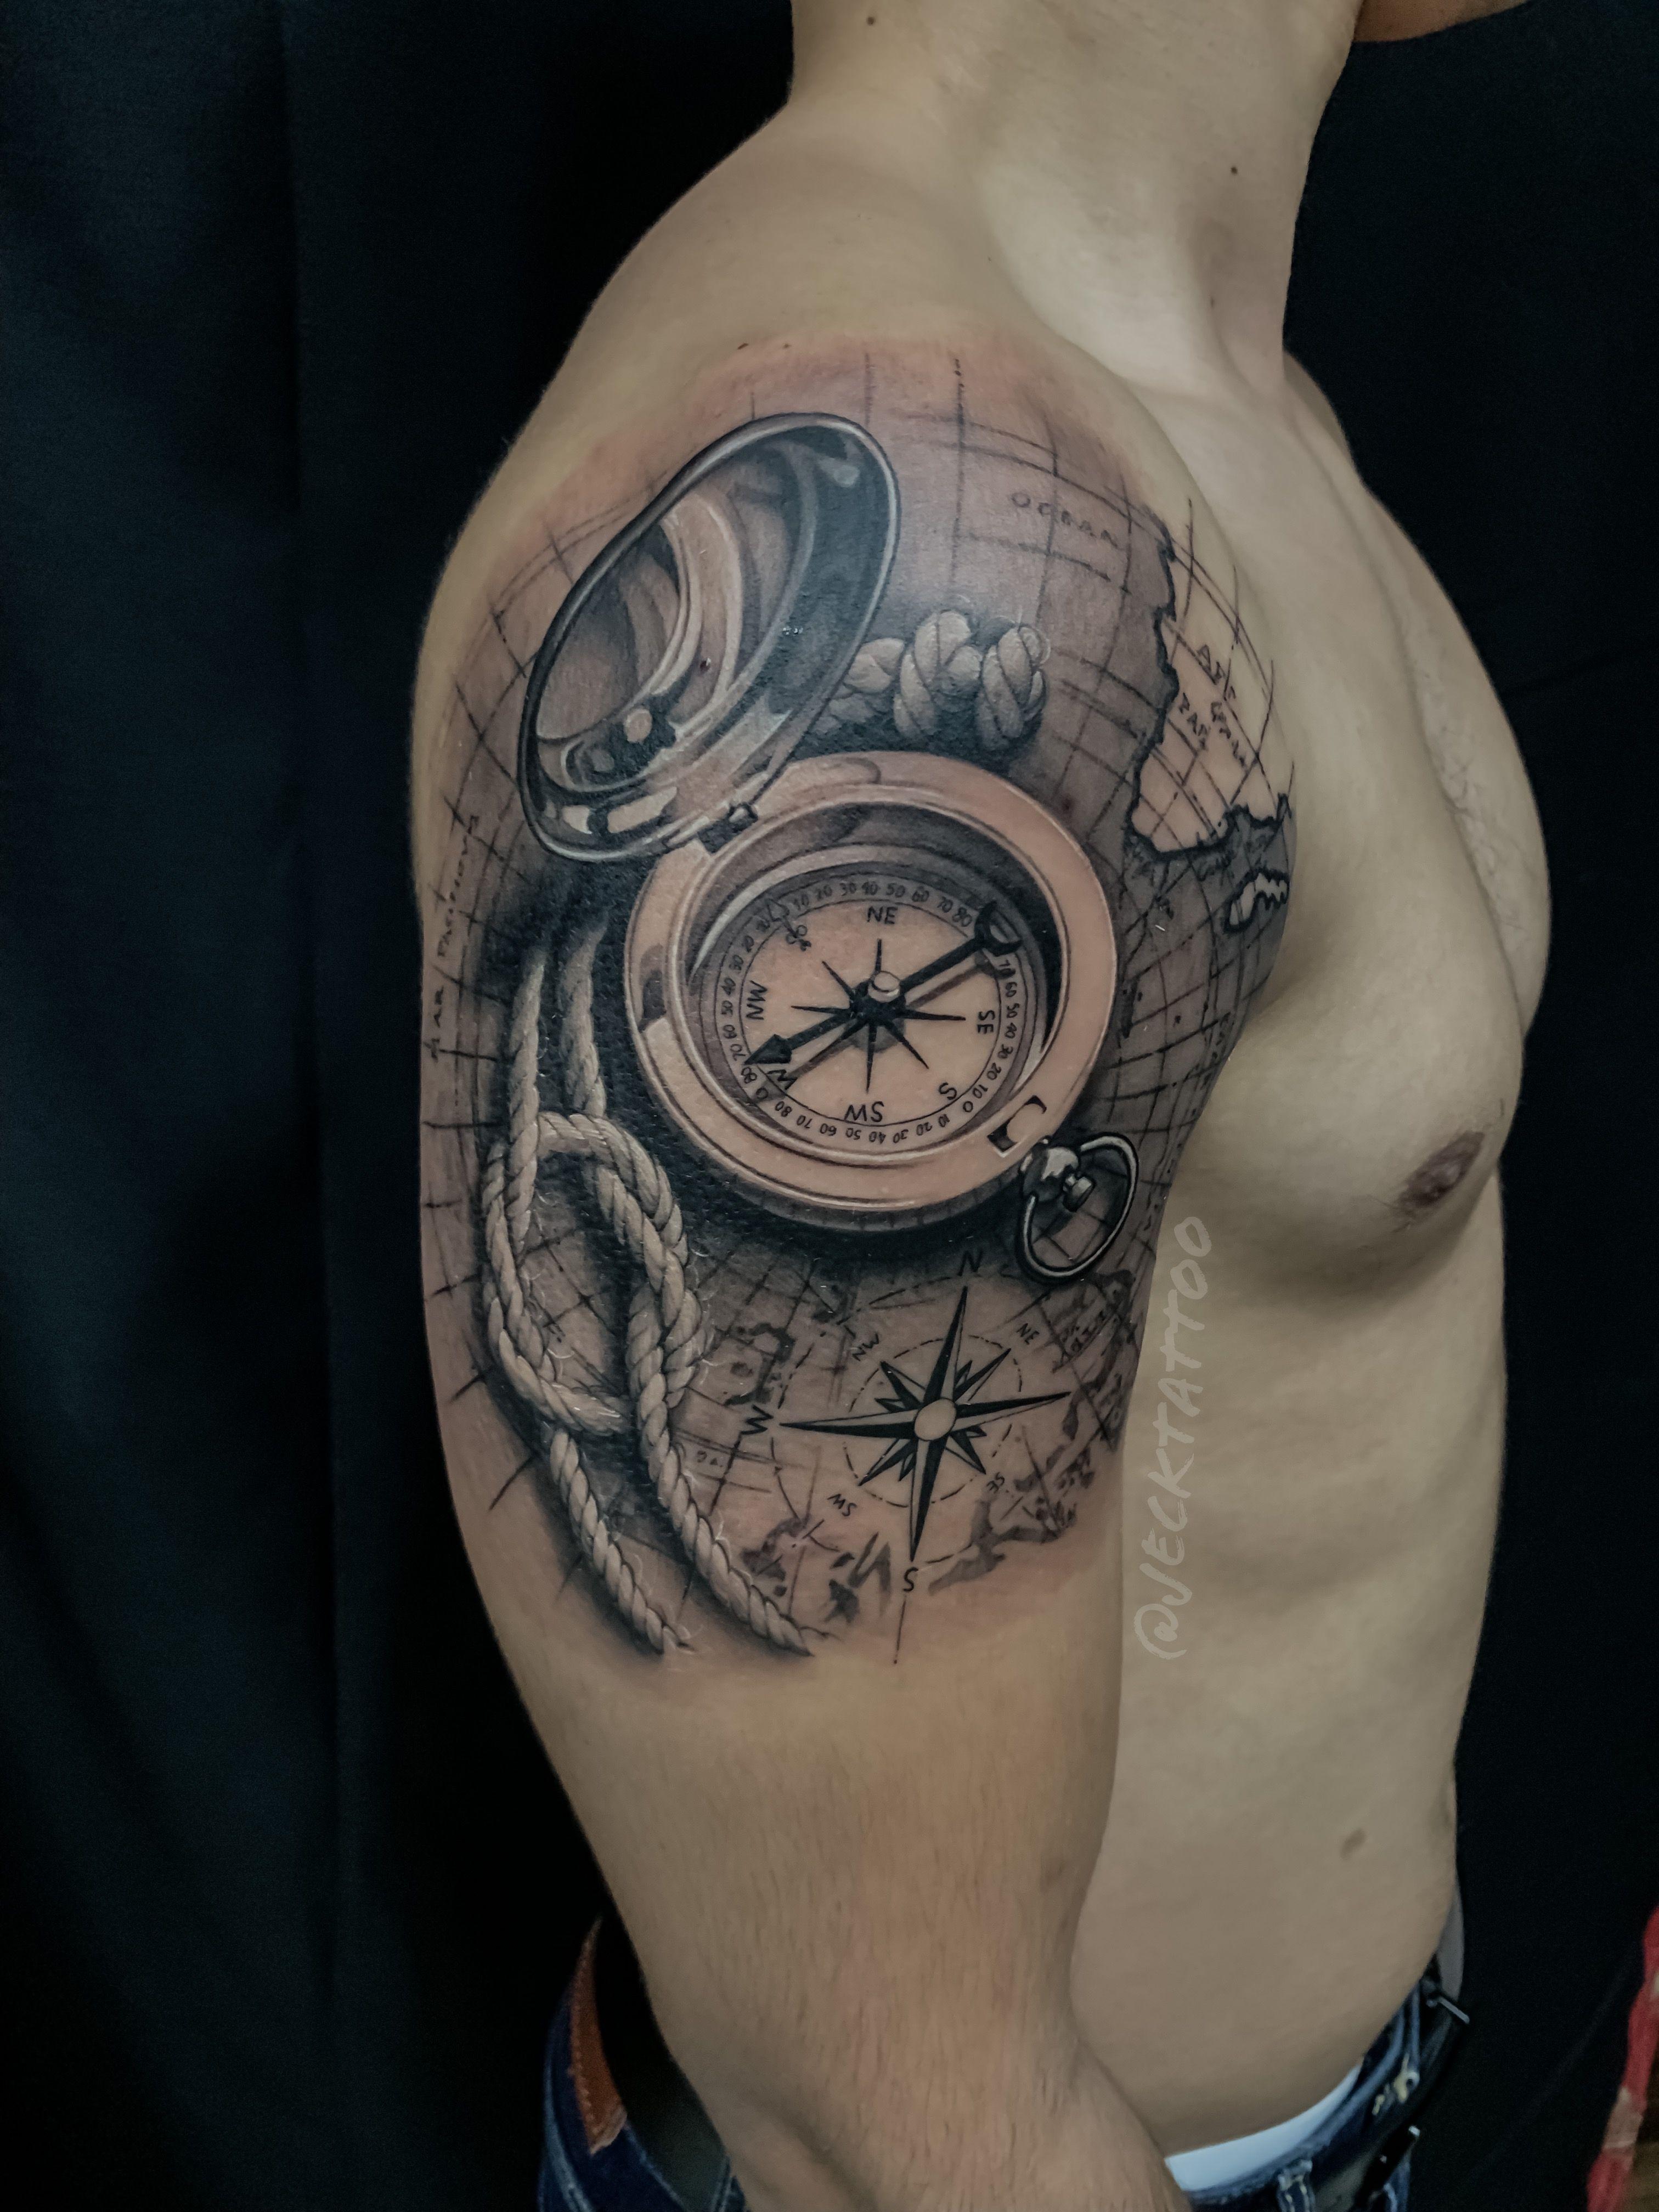 Tattoo In 2020 Sleeve Tattoos Tattoos Tattoos For Guys